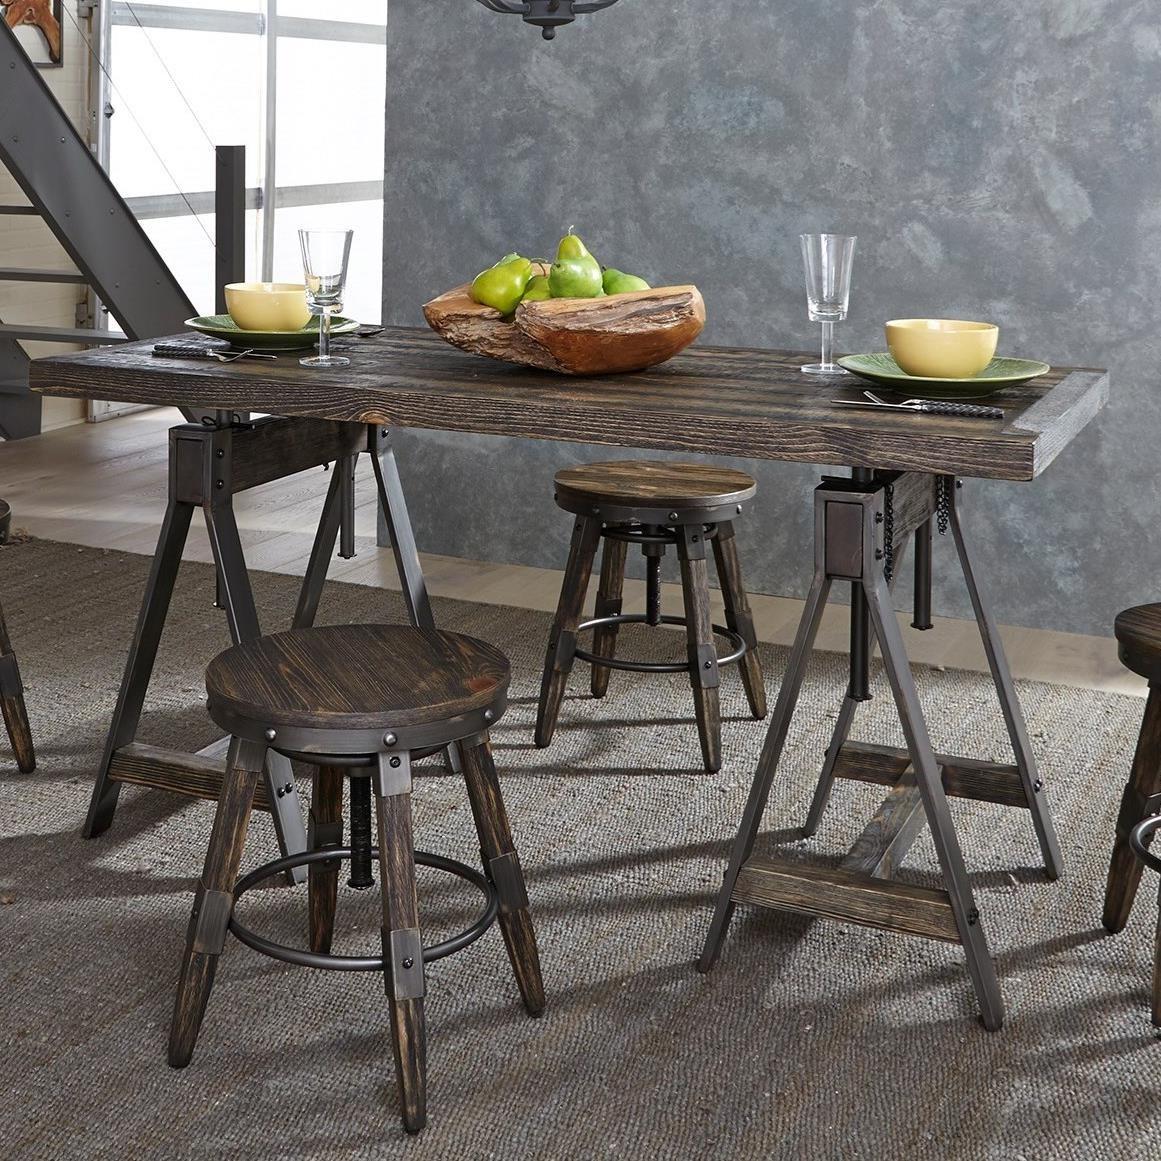 Liberty Furniture Pineville Industrial Adjustable Height